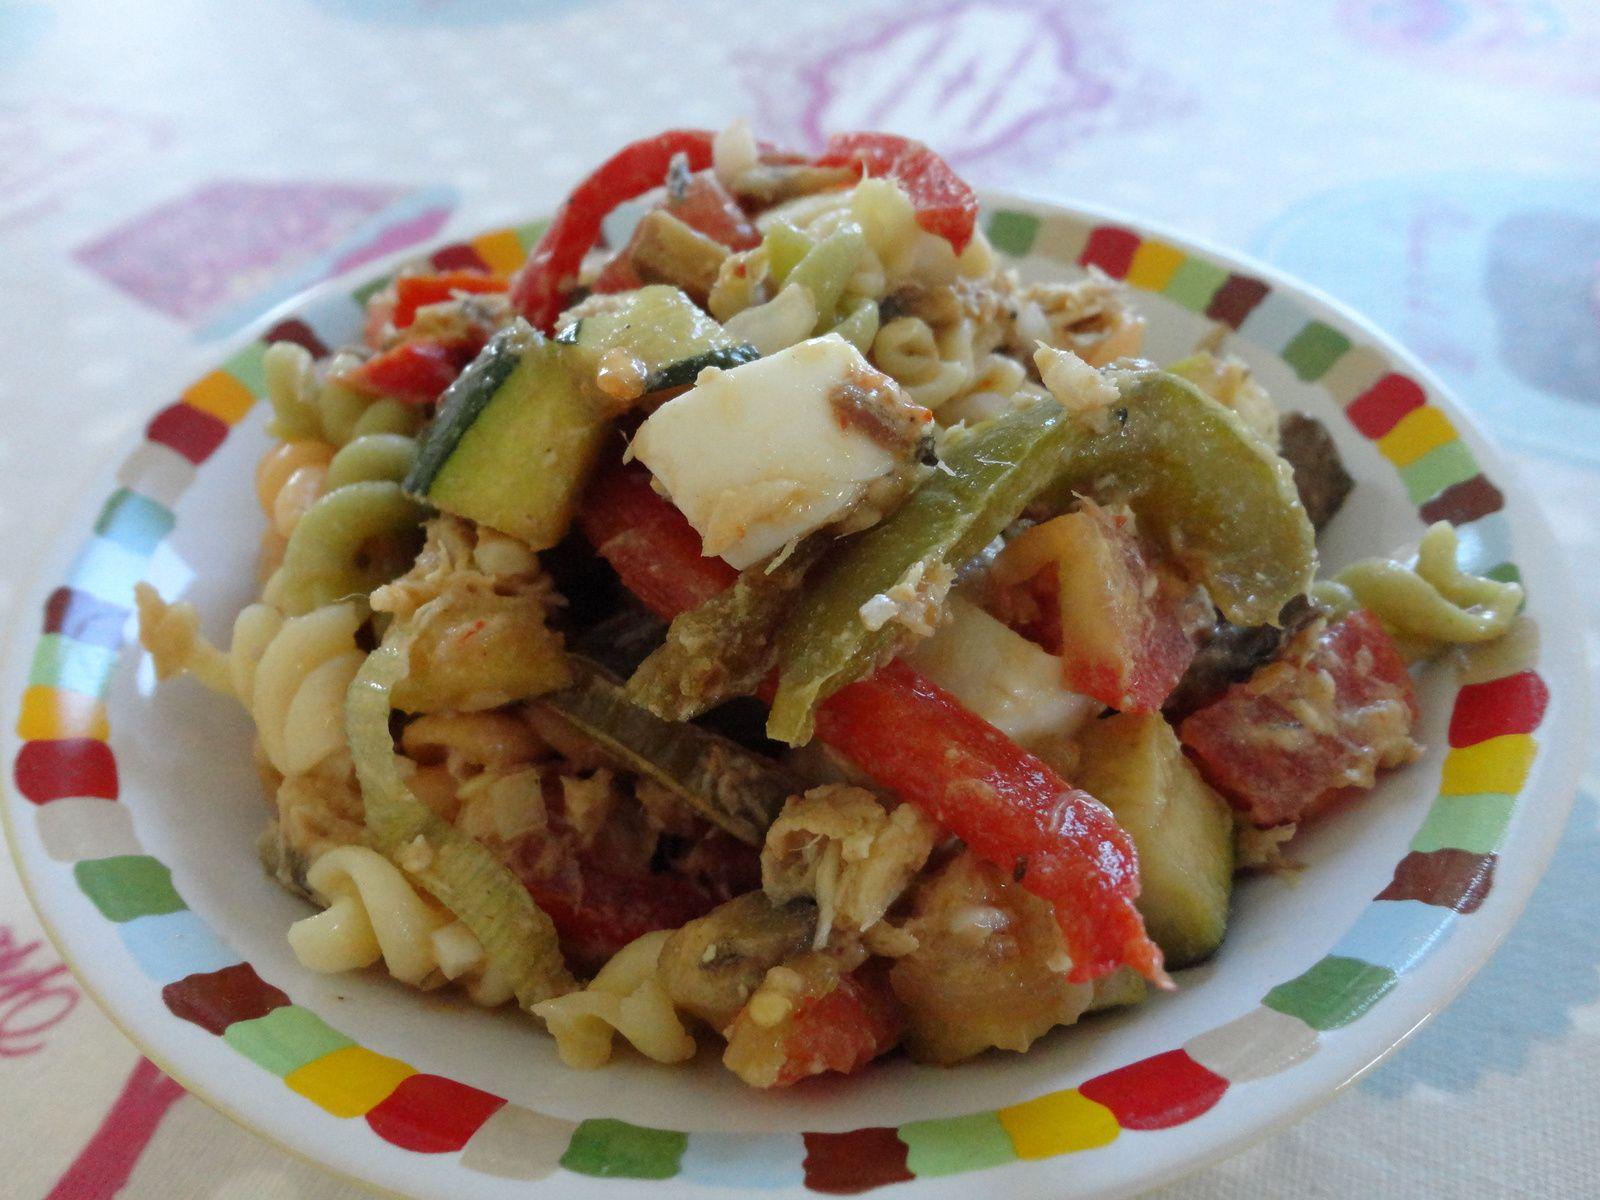 salade de pates au maquereau